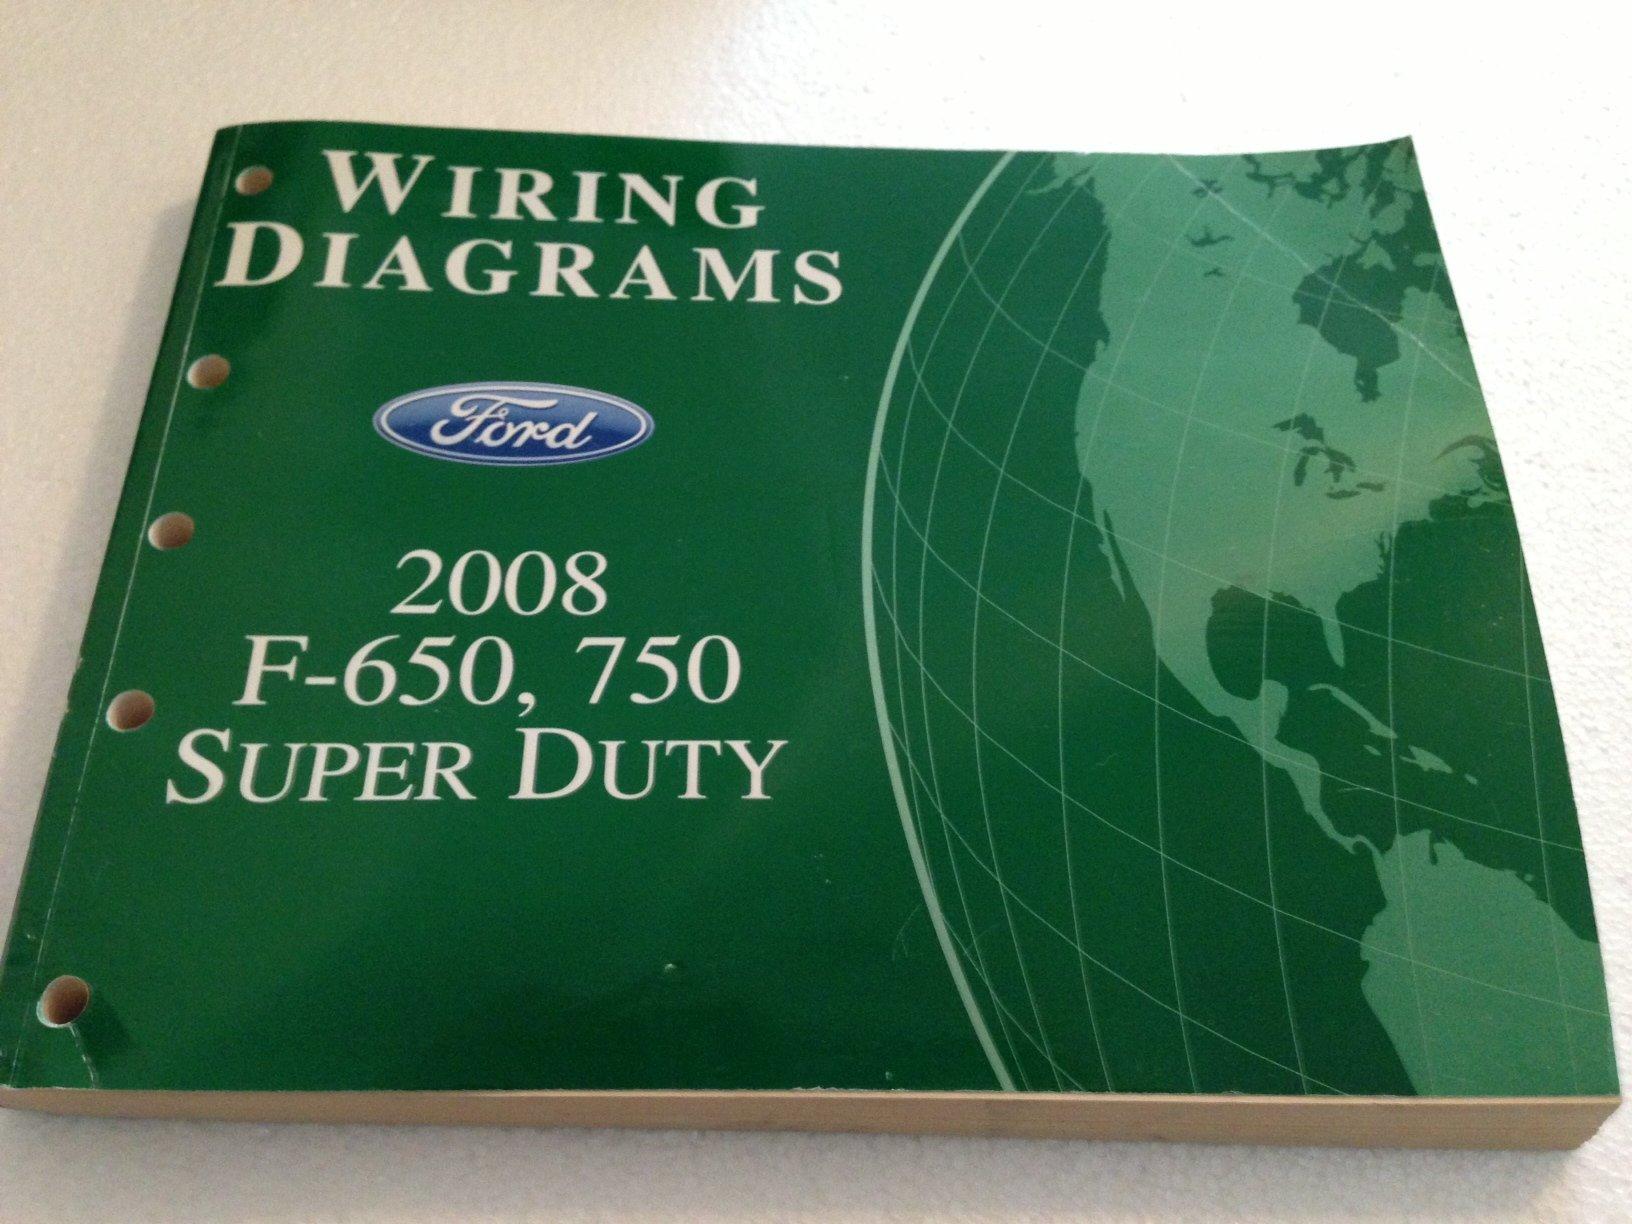 Remarkable Wrg 3124 2008 F650 Fuse Box Wiring Cloud Inklaidewilluminateatxorg